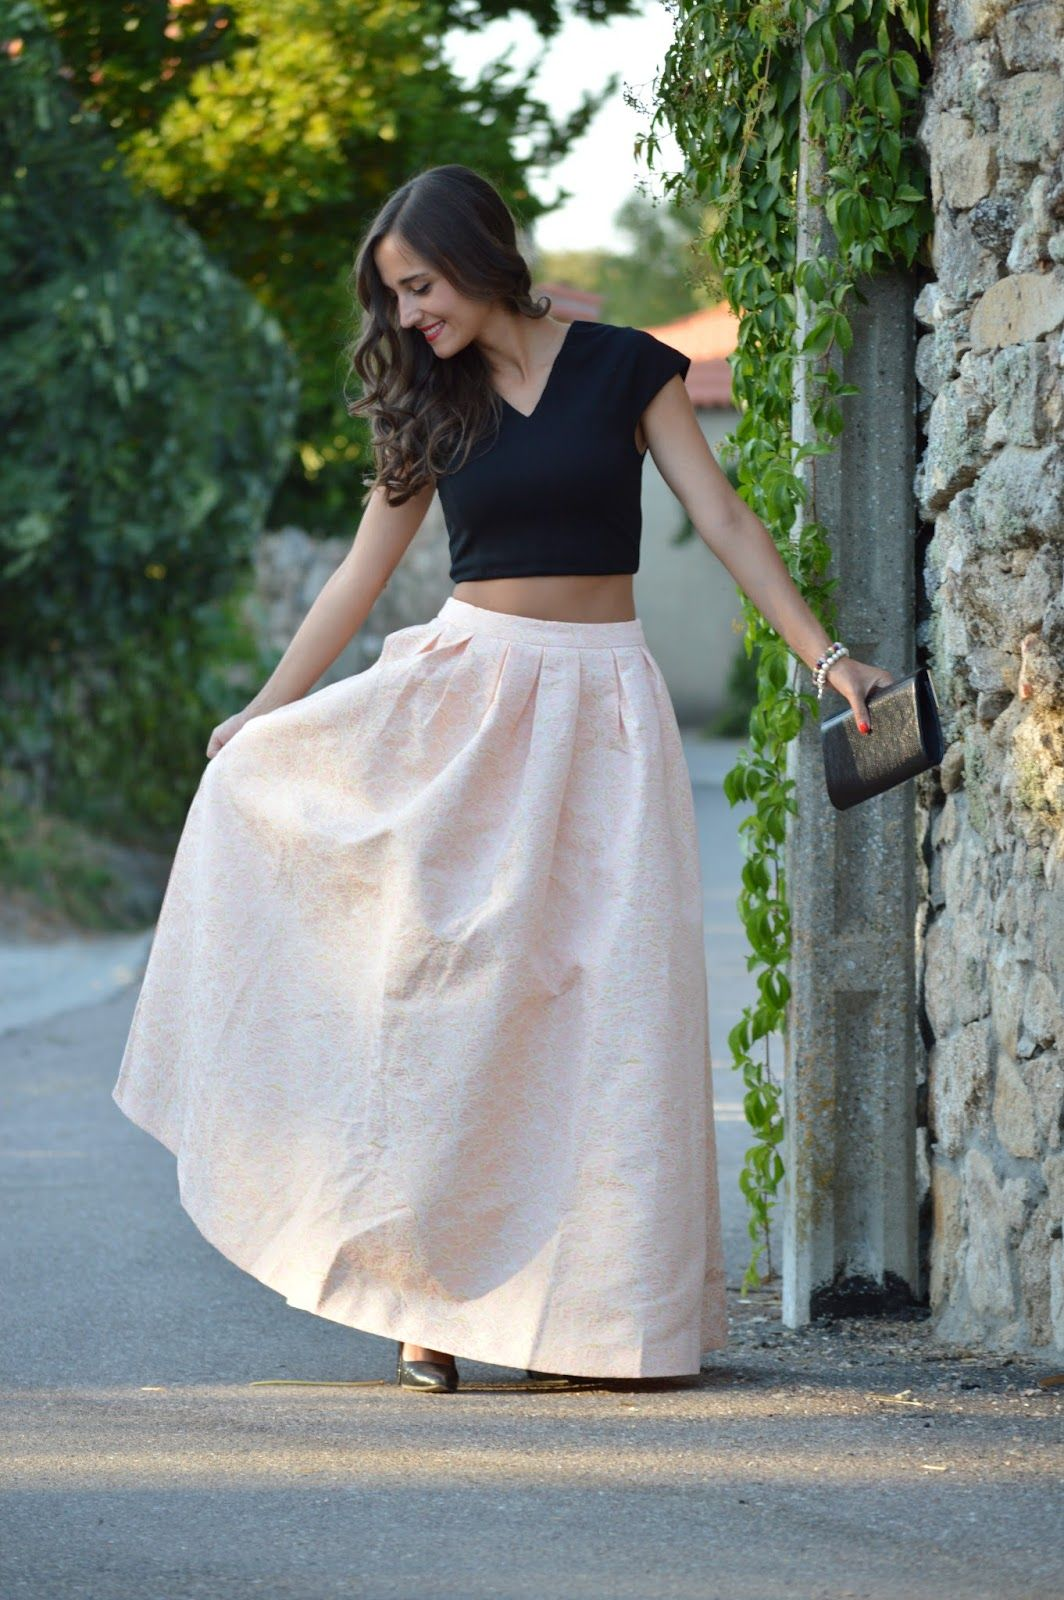 1000 MANERAS DE VESTIR: Falda princesa. Black crop top+white and salmon brocade maxi skirt+black pumps+black clutch. Late Summer Evening Wedding Outfit 2016